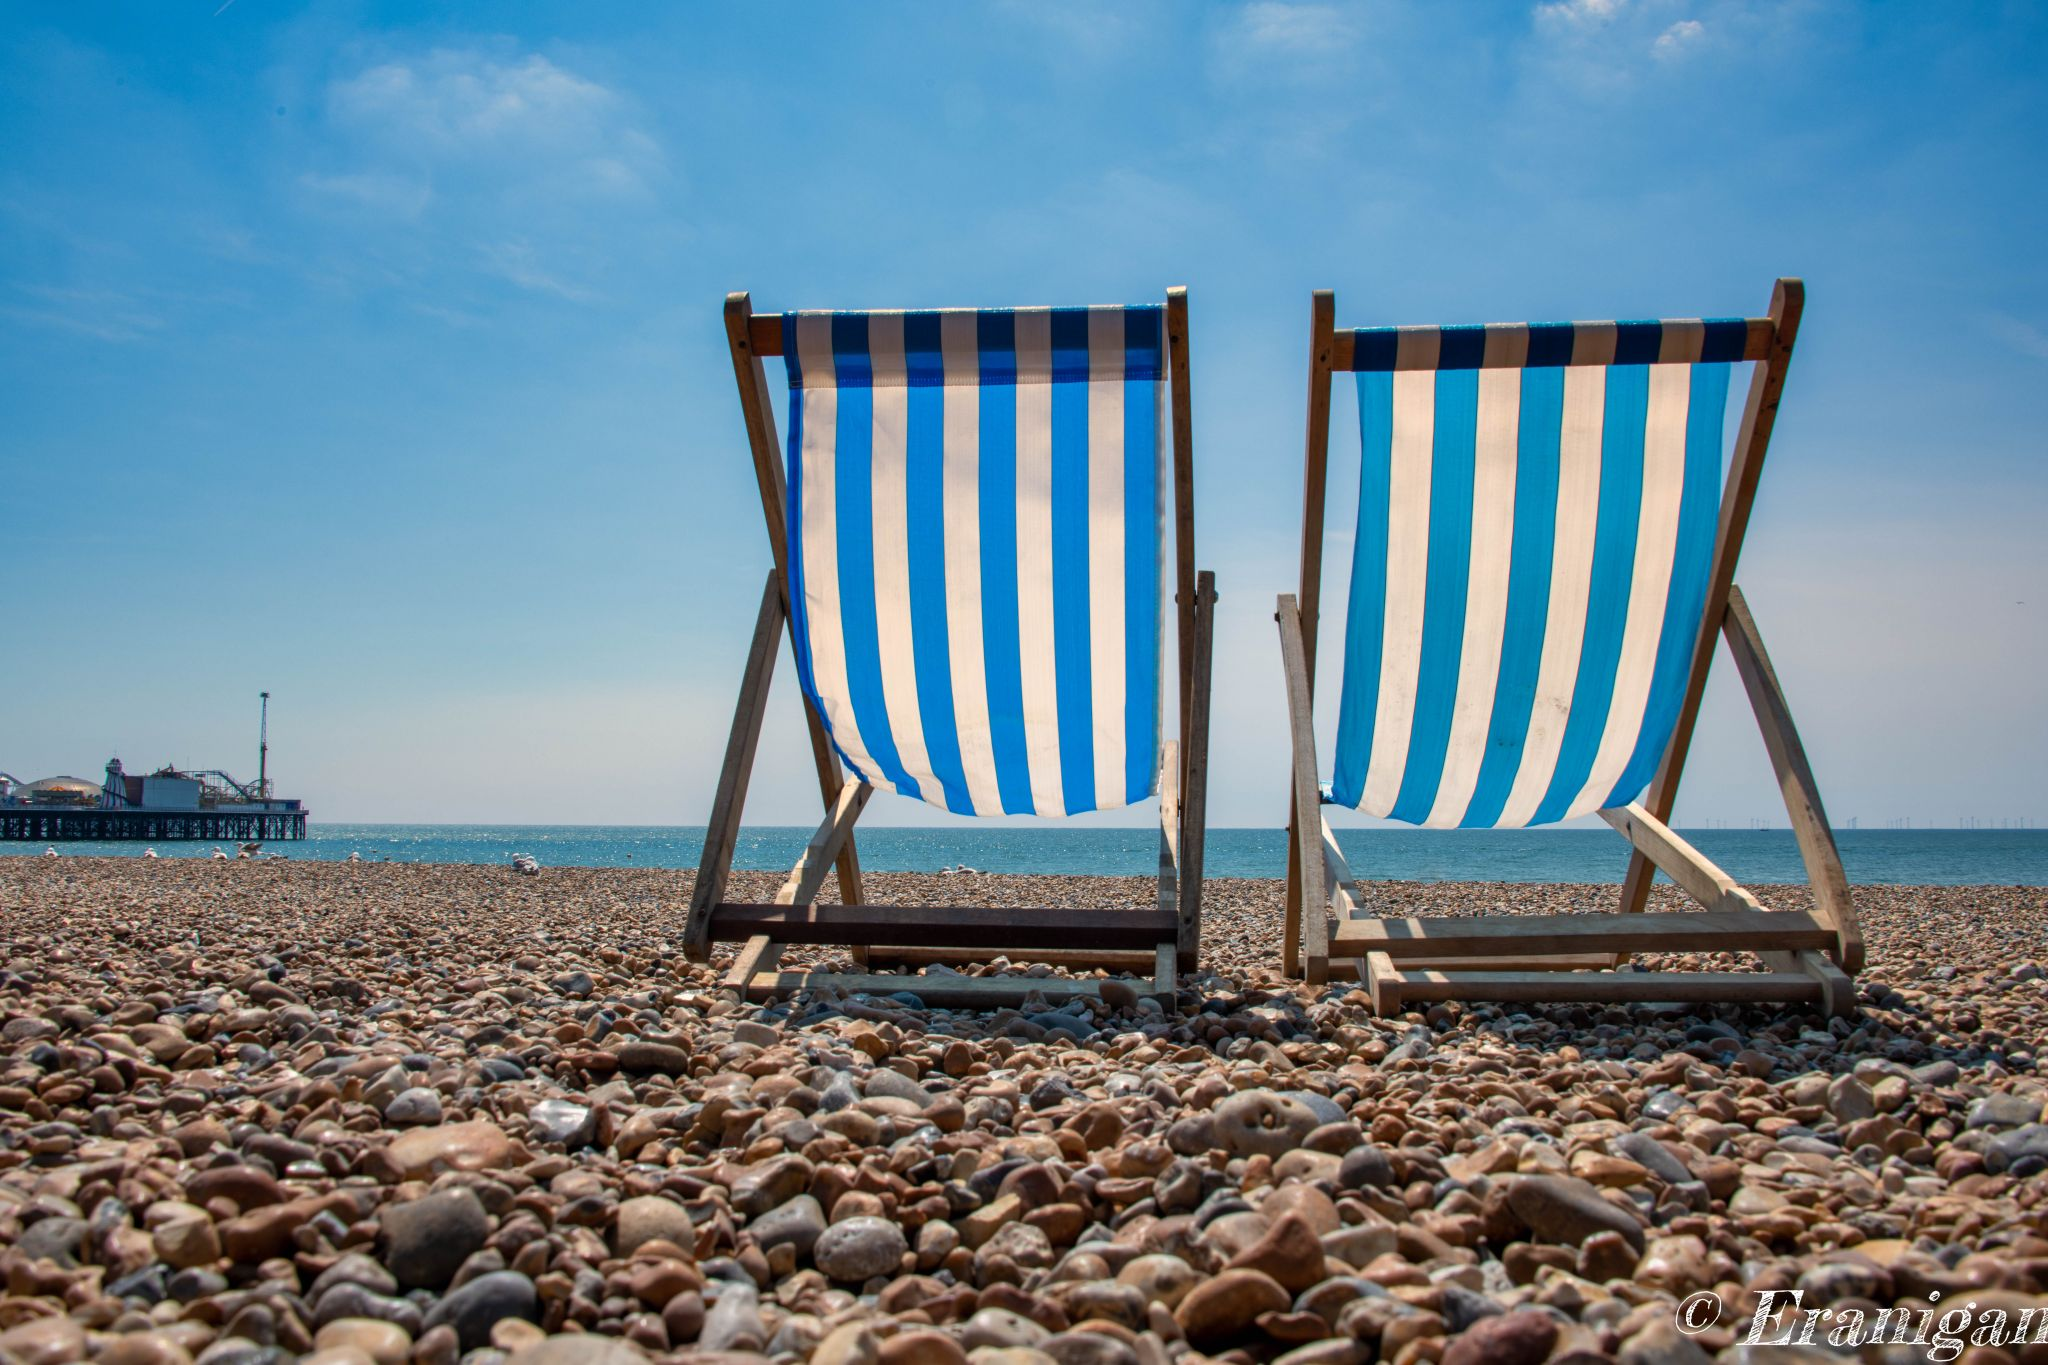 Brighton beach, United Kingdom